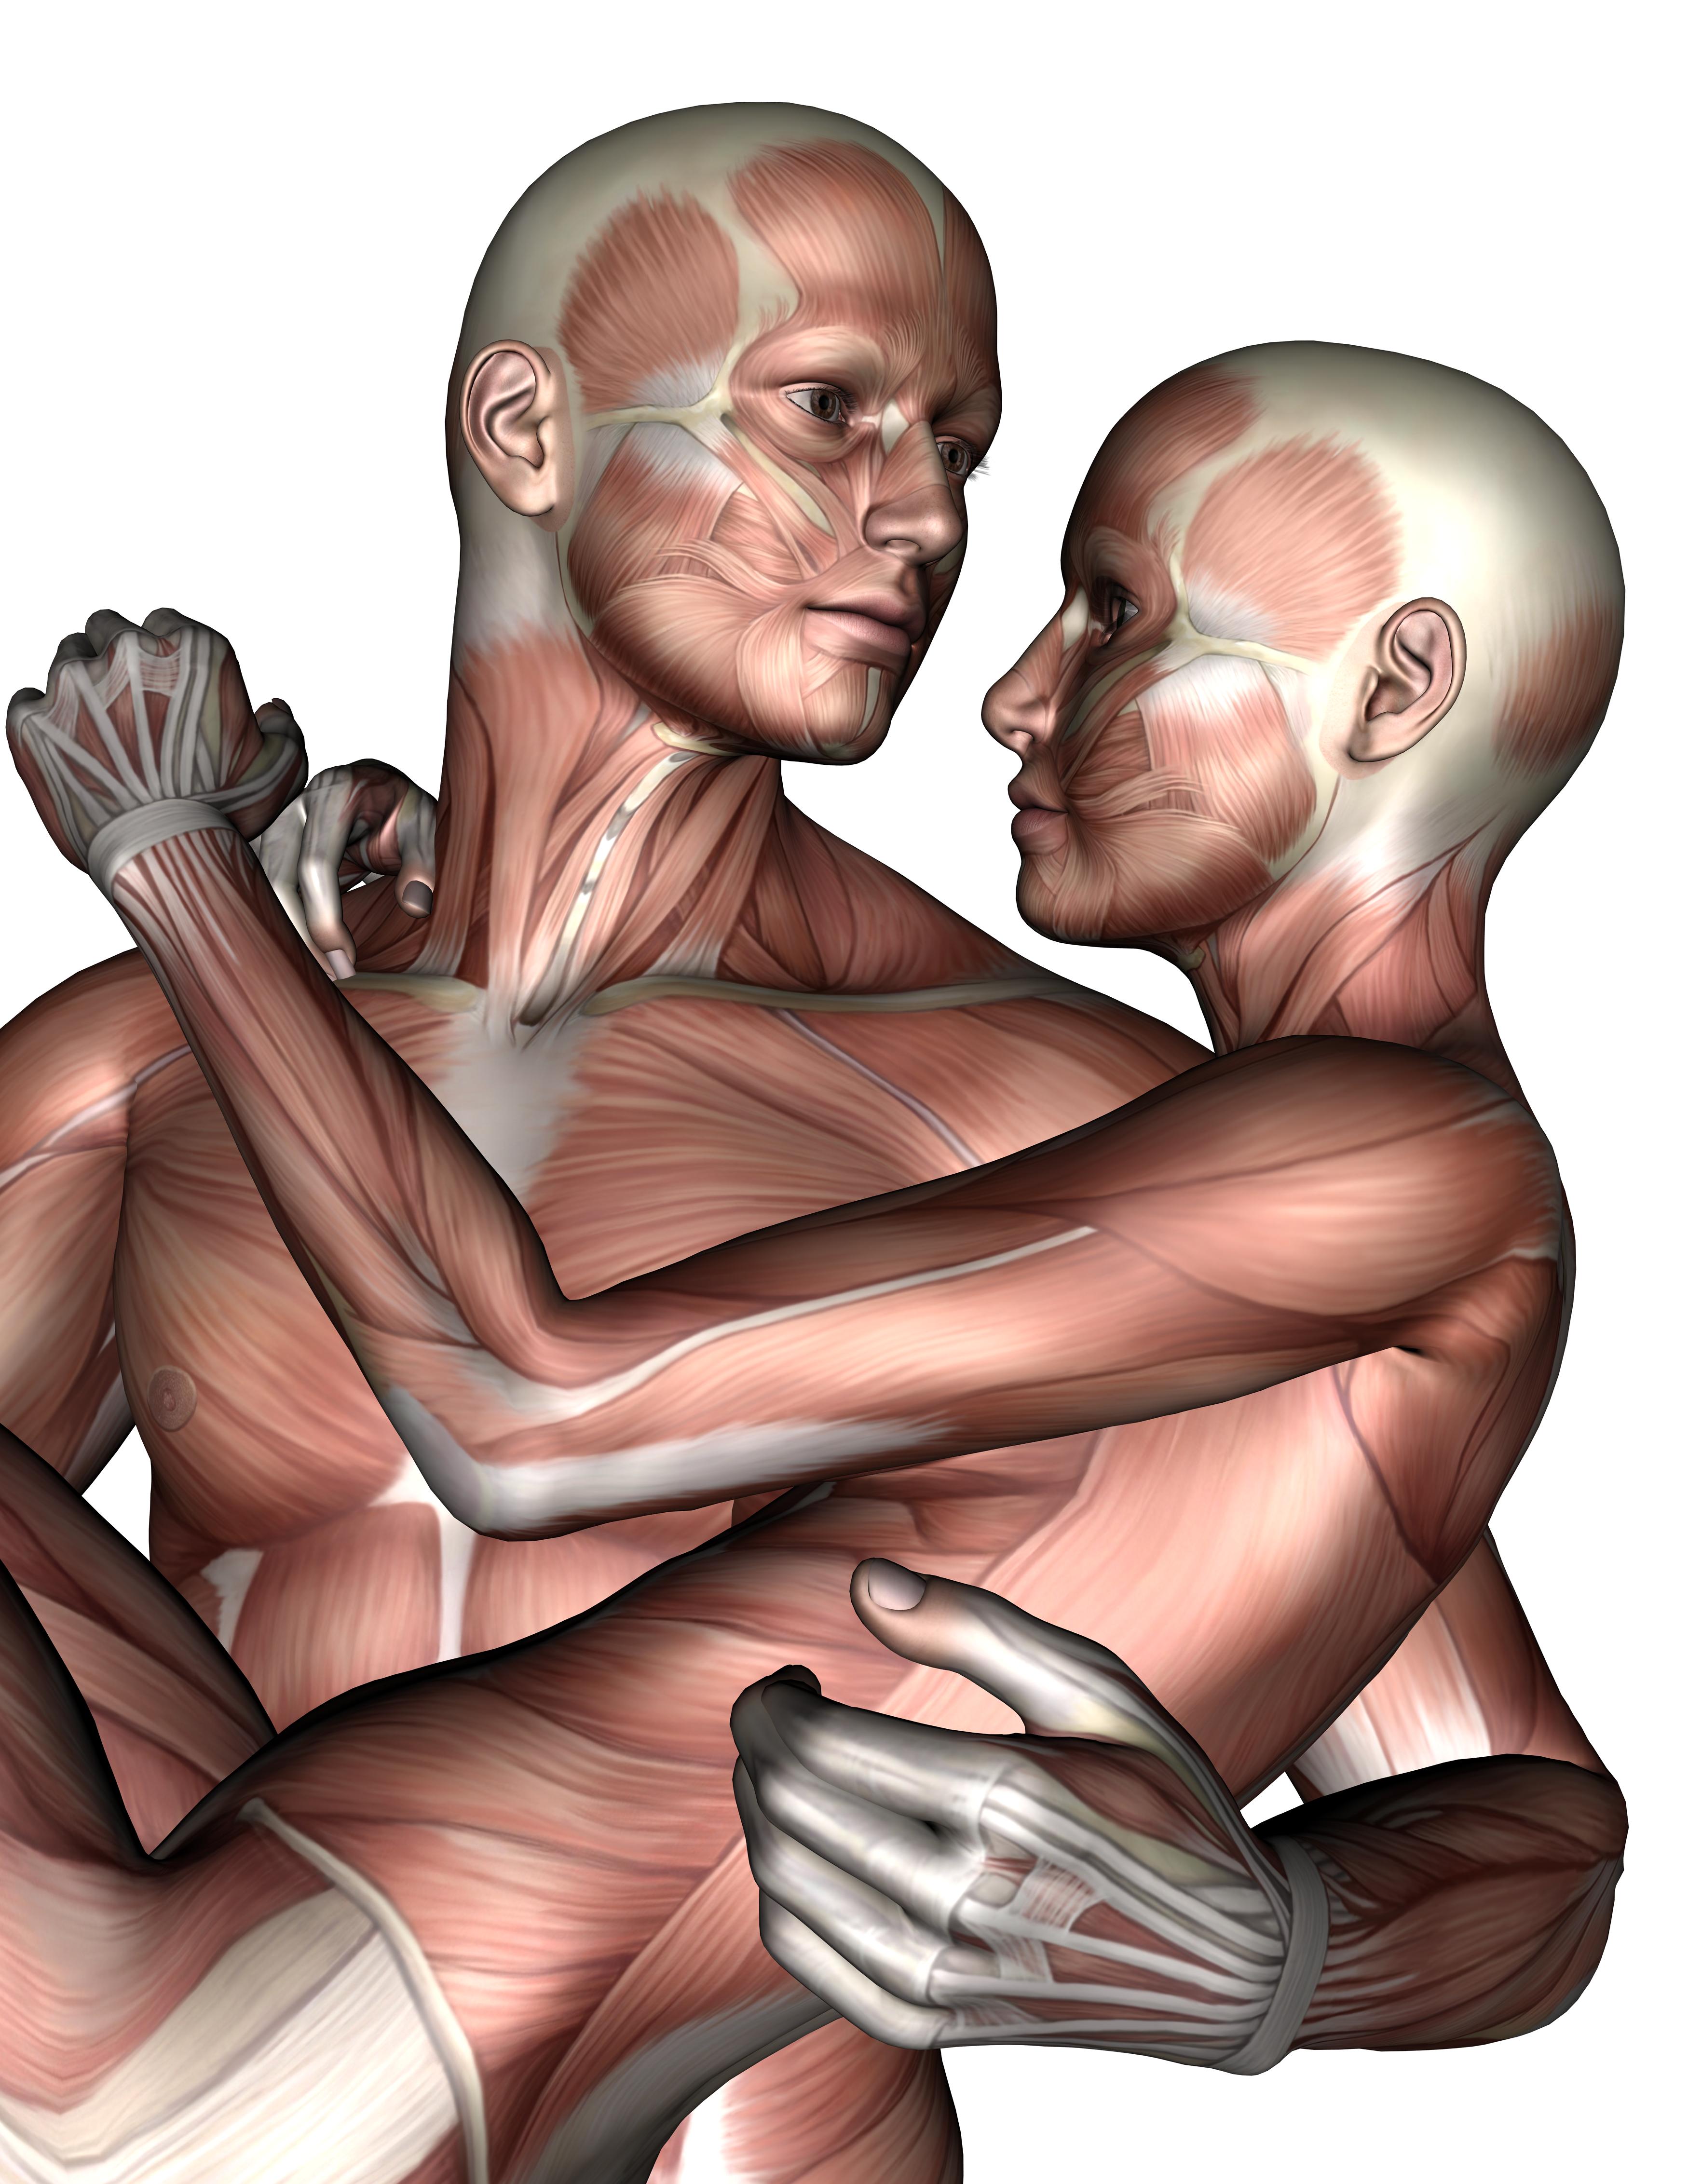 Lovers, 3d, Anatomy, Female, Love, HQ Photo